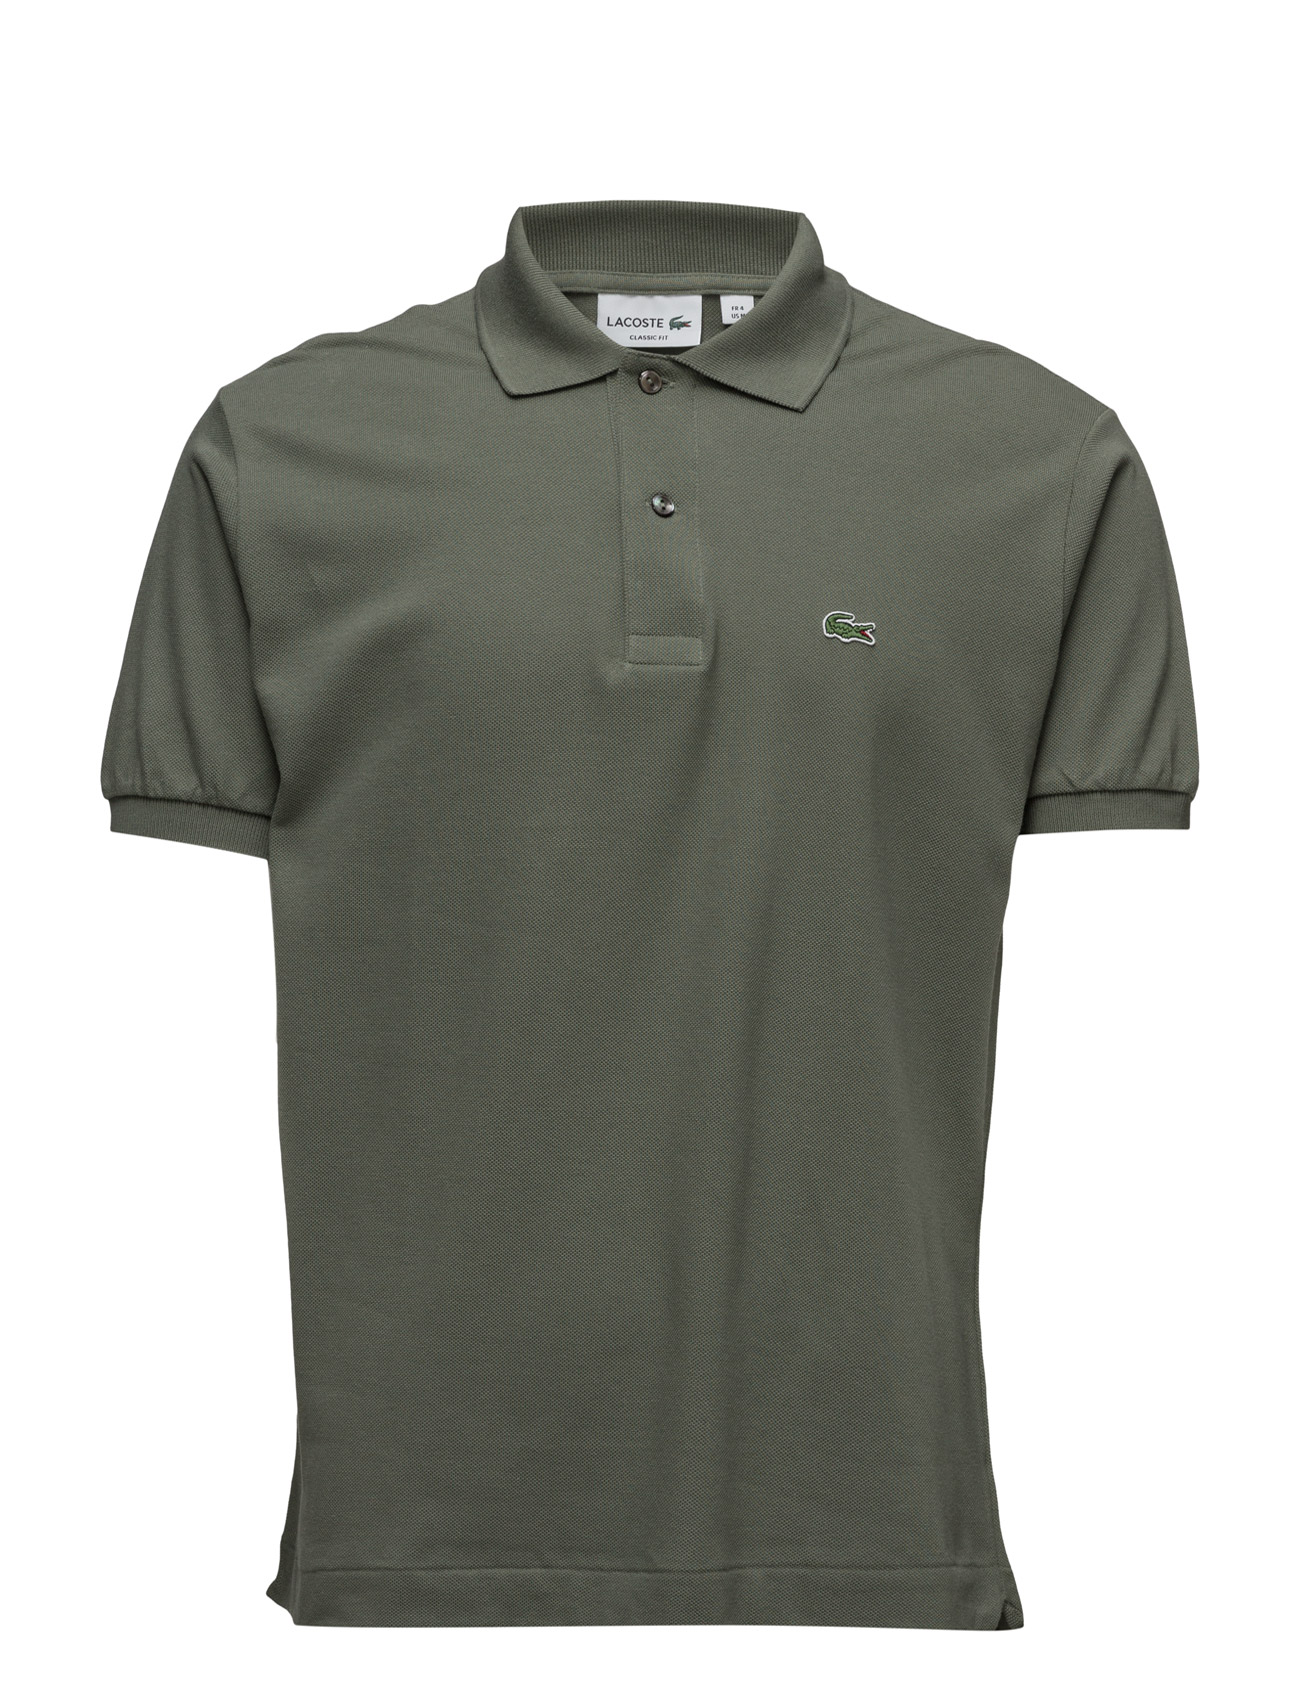 Chemise Col Bor Lacoste Polo t-shirts til Mænd i